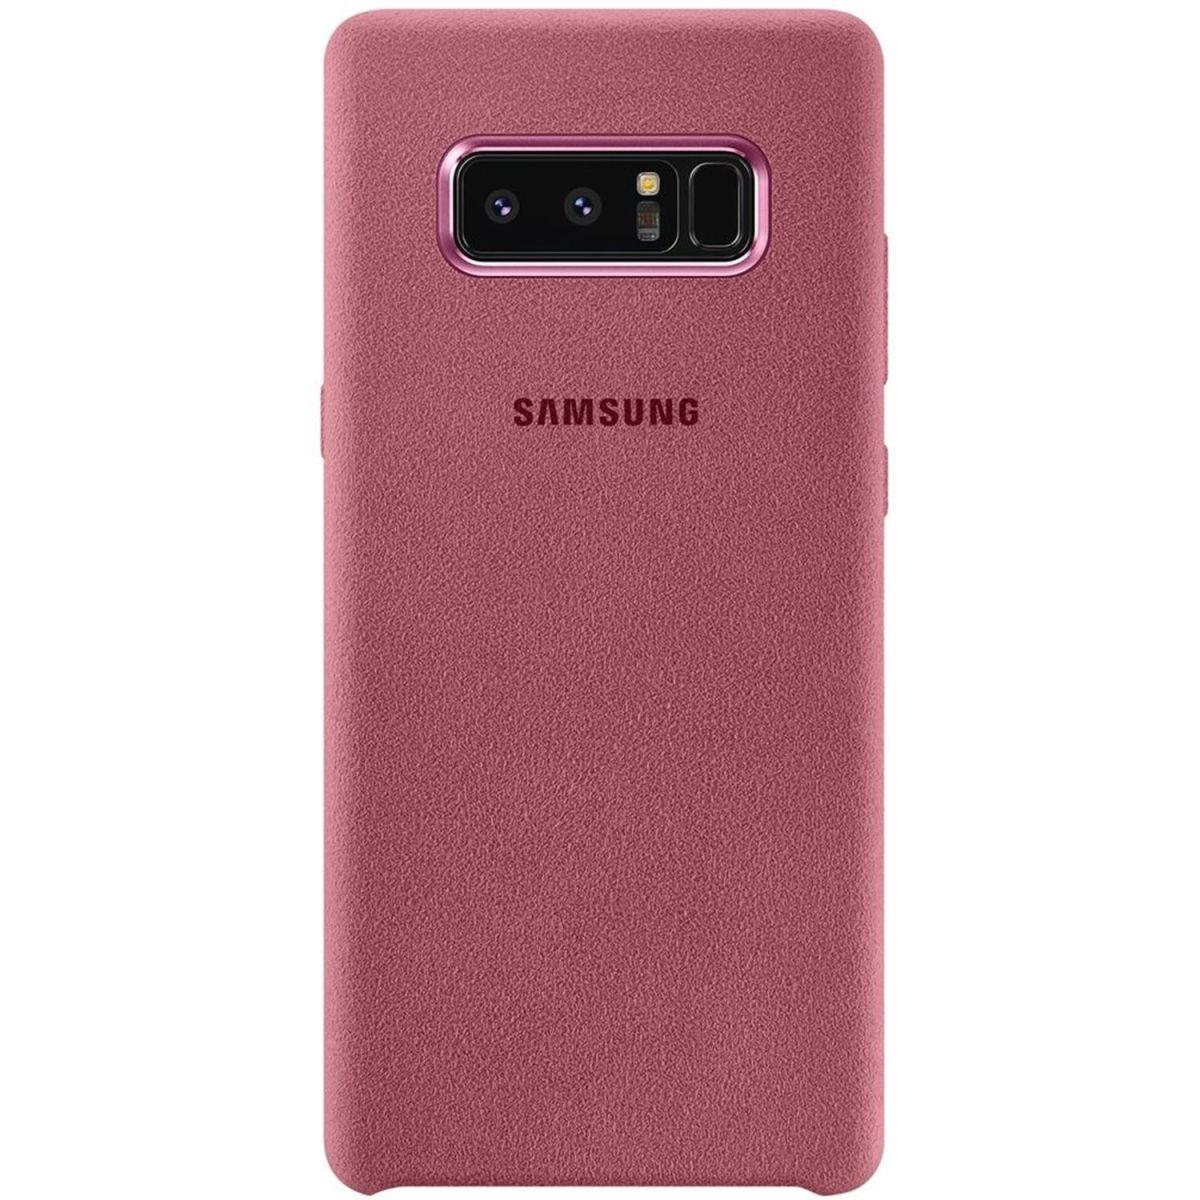 Capac protectie spate Alcantara Cover Pink pentru Samsung Galaxy Note 8 (N950), EF-XN950APEGWW